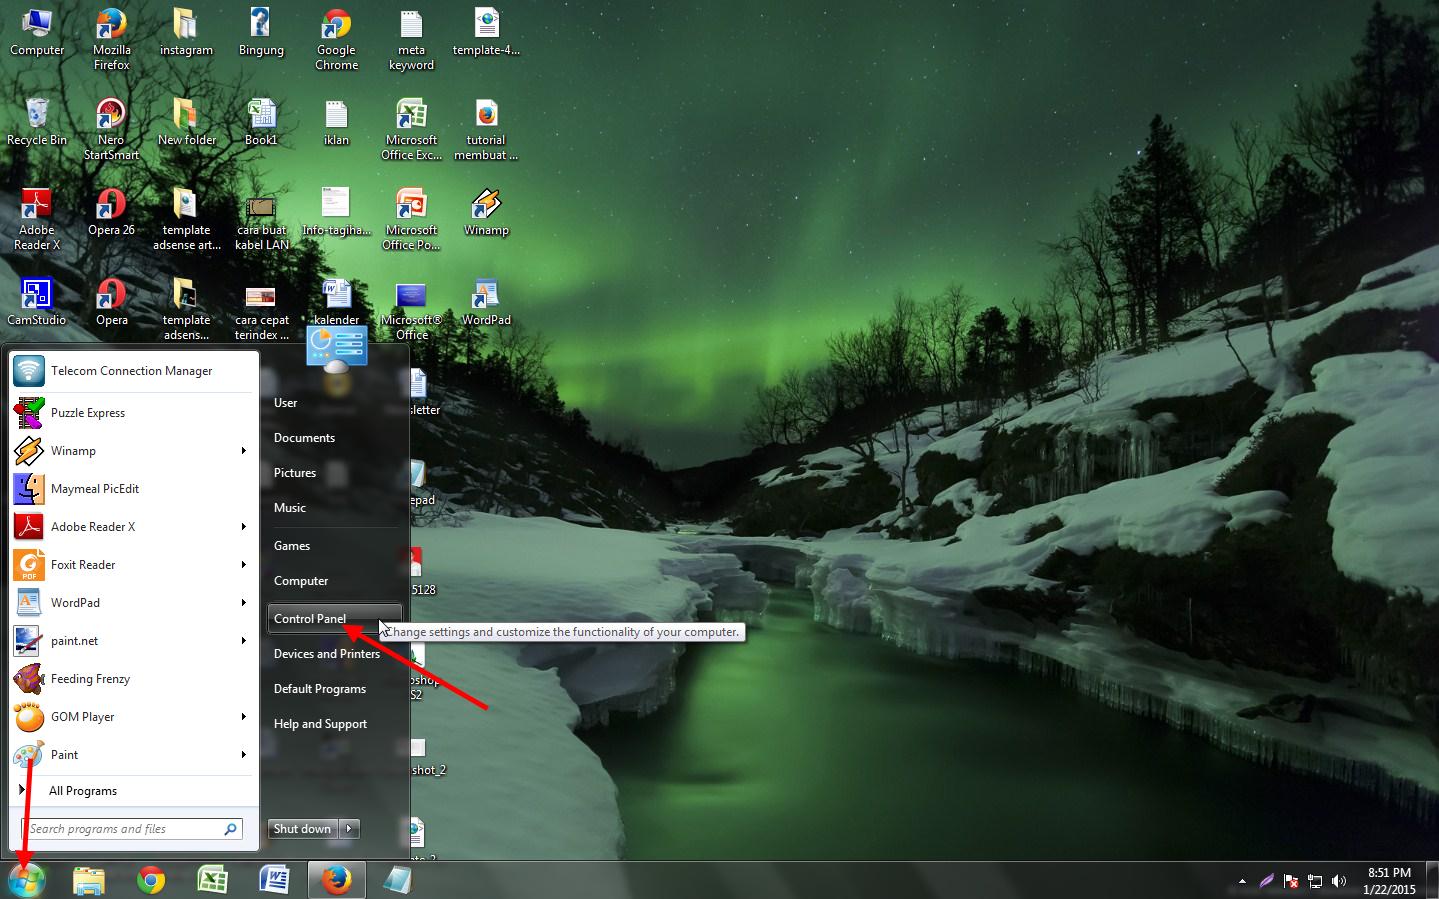 cara menghapus program di windows 7